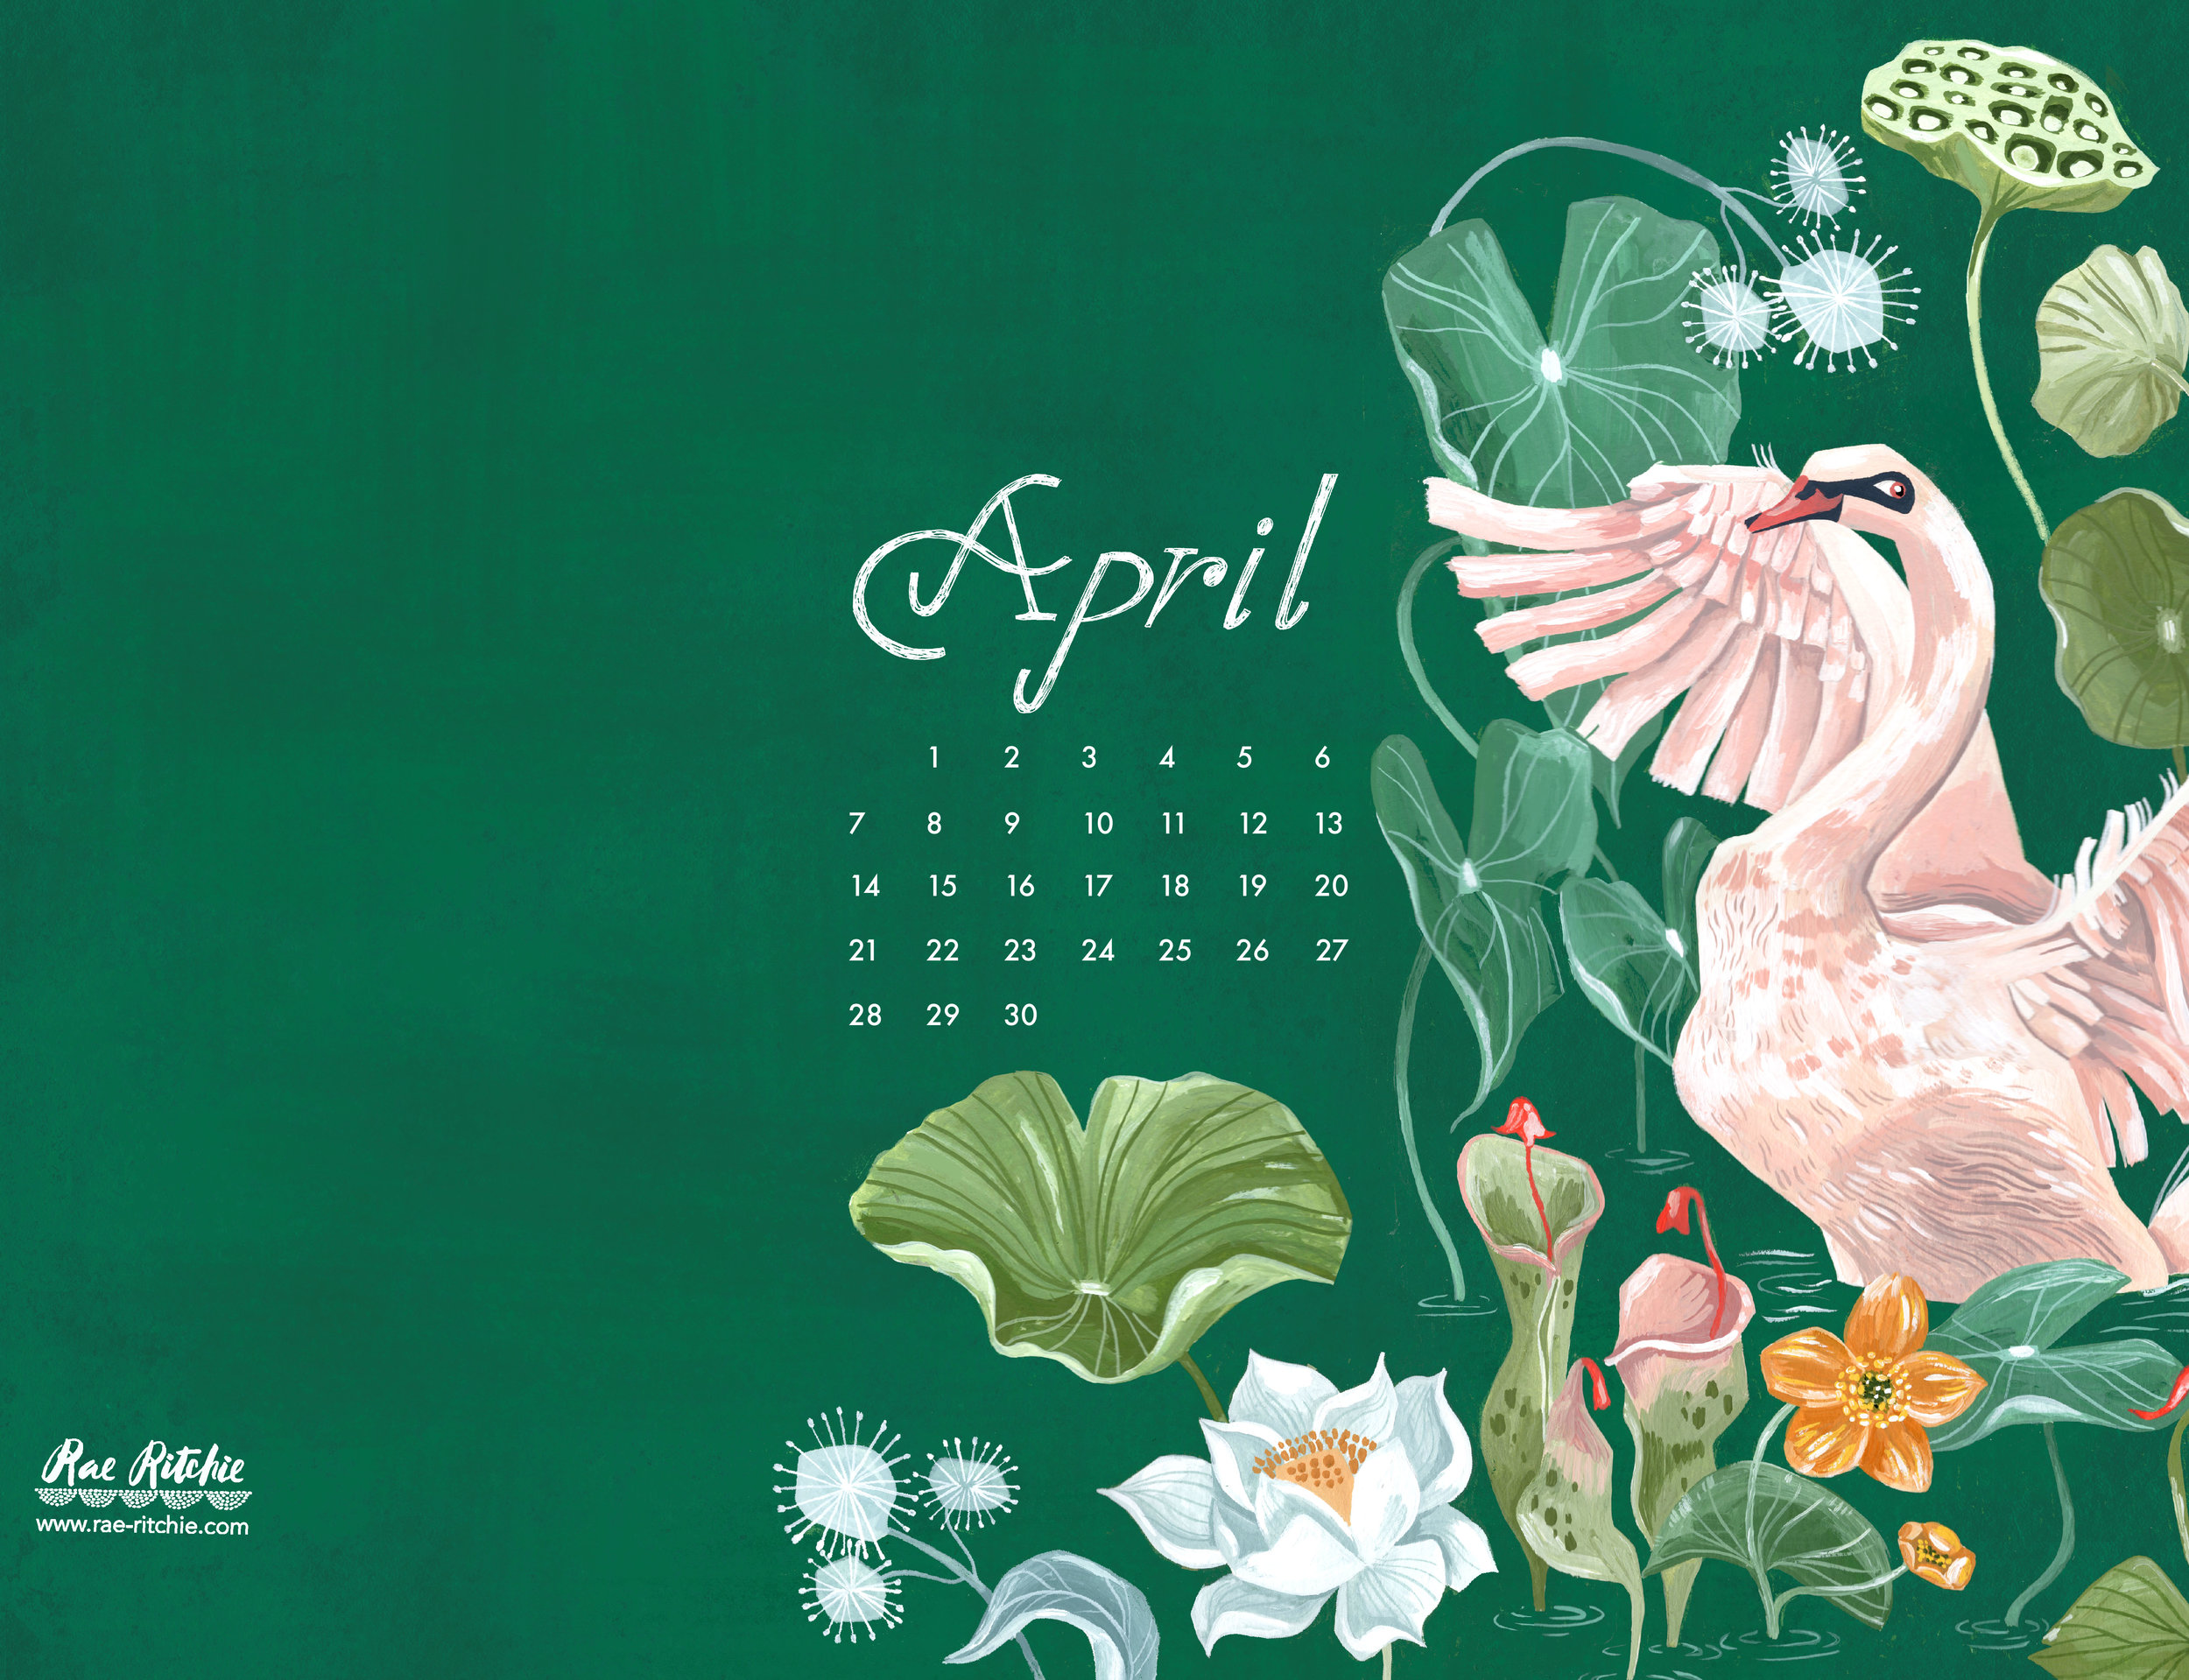 April19__Ipad.jpg